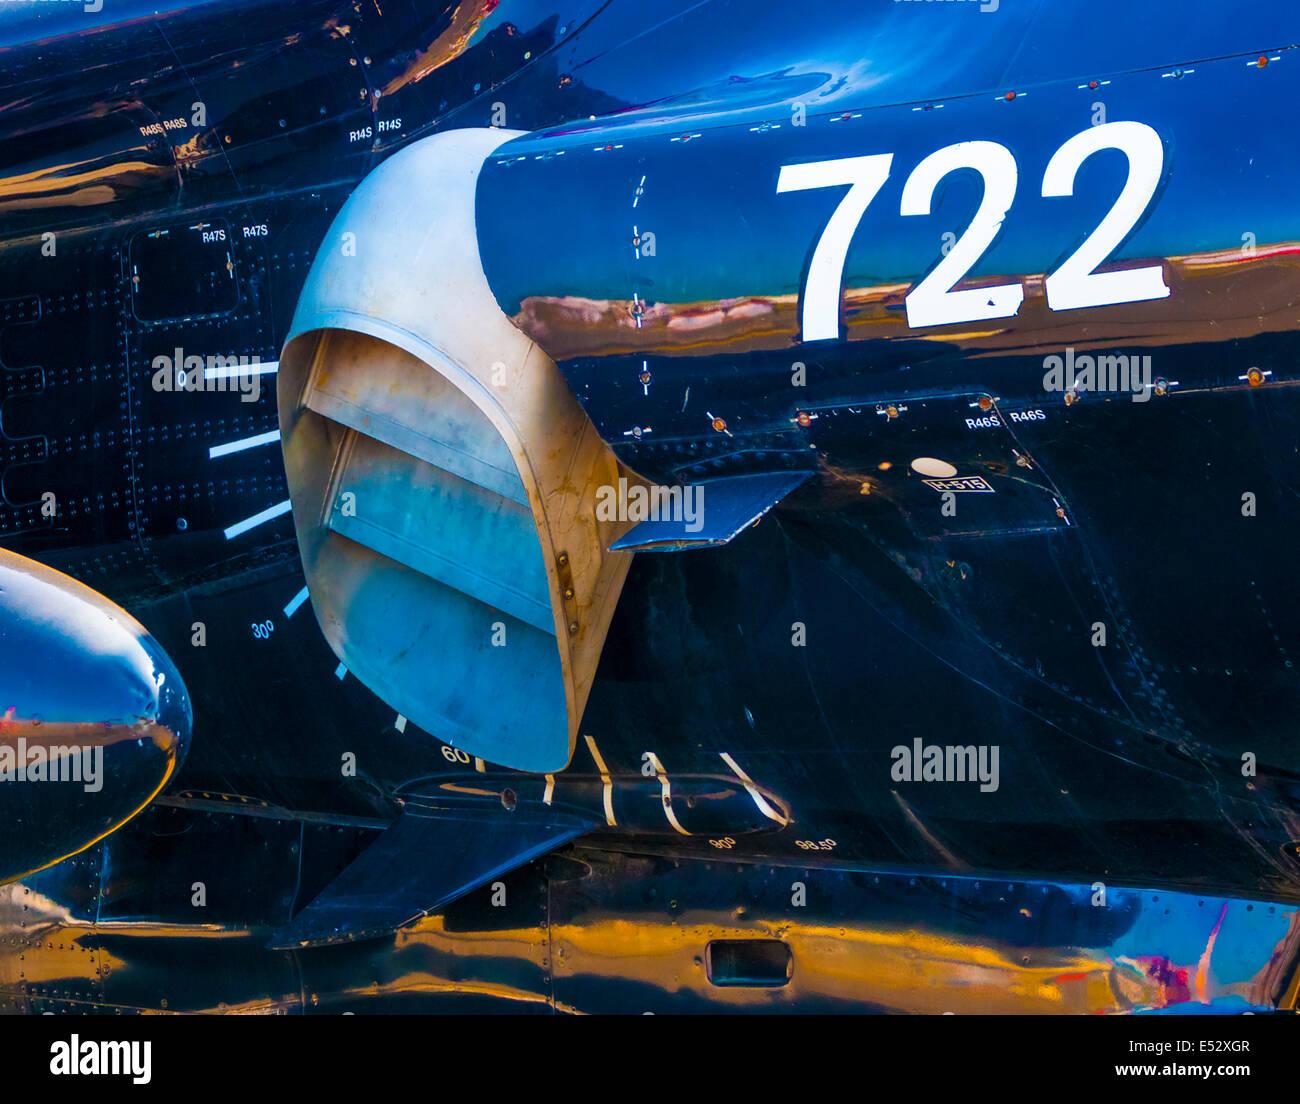 Directed thrust engine exhaust nozzle on British Aerospace Harrier T8 - Stock Image